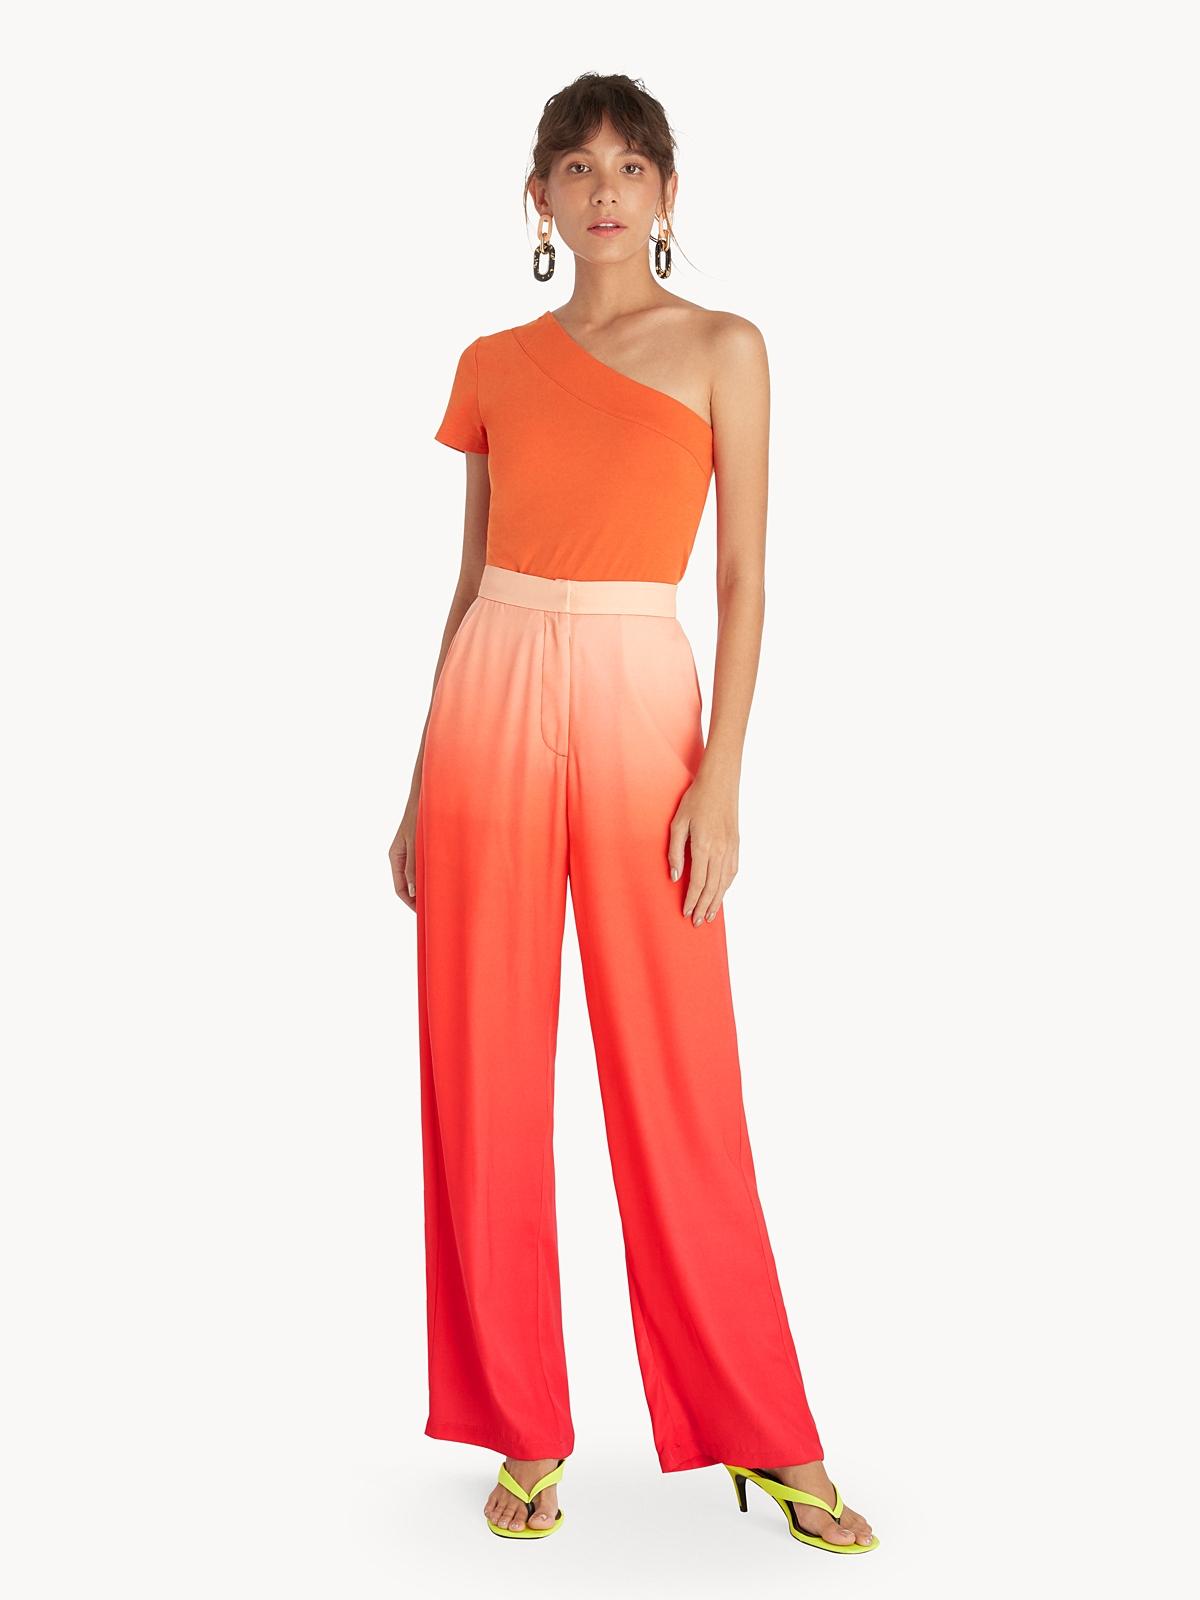 One Shoulder Slim Fit Top Orange